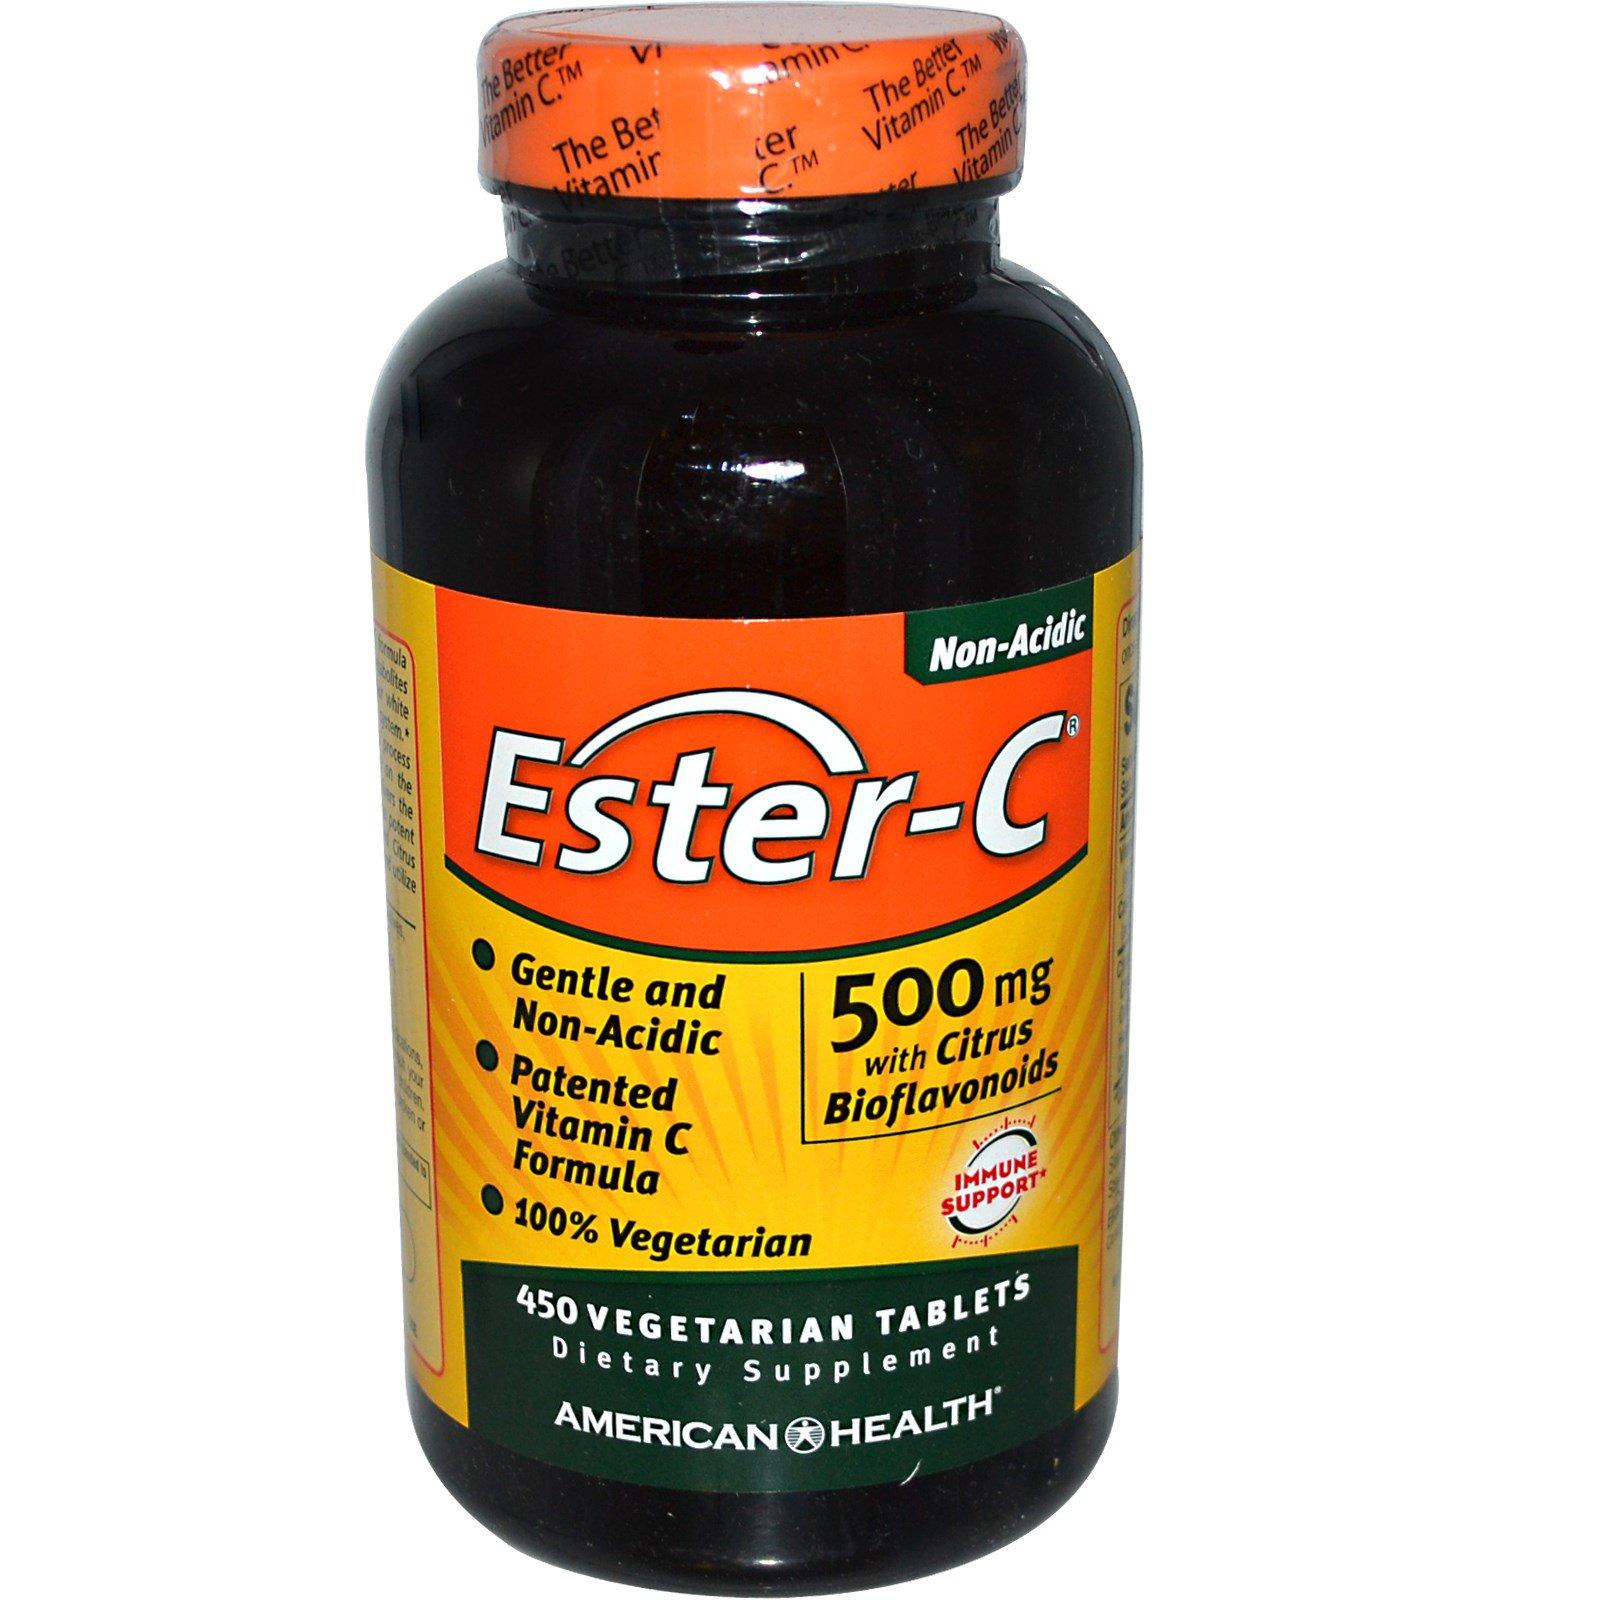 Image of Ester-C with Citrus Bioflavonoids 500 mg (450 Veggie Tabs) - American Health 0076630169561